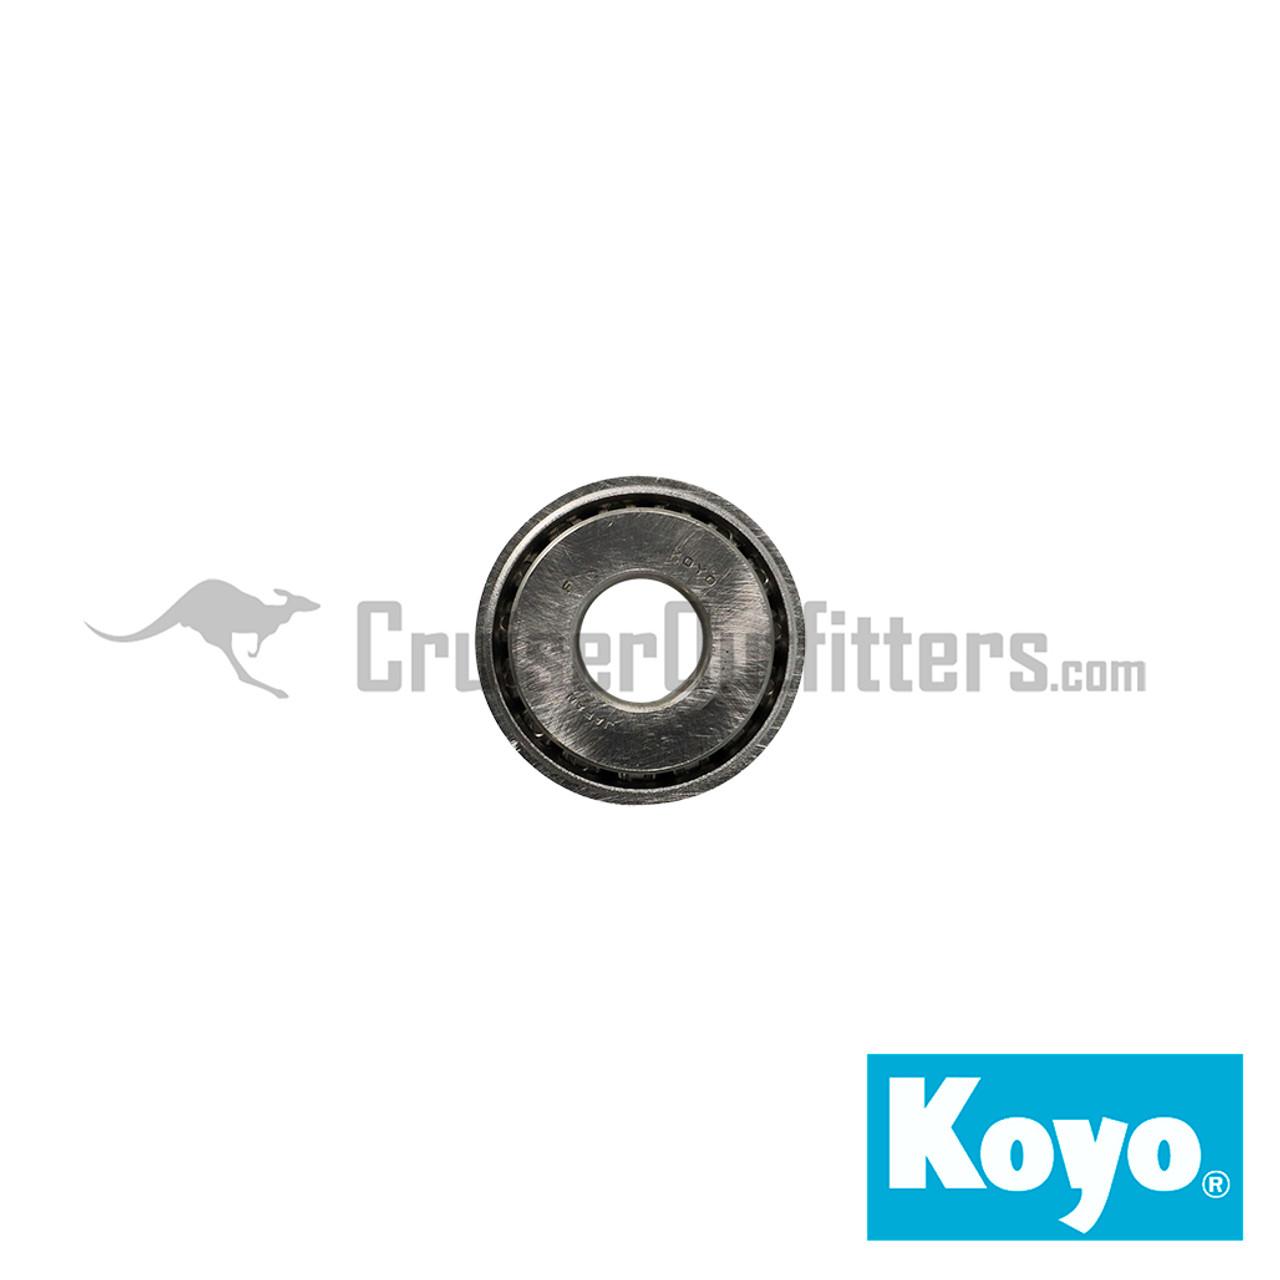 Knuckle Bearing - Koyo - Fits 1958 - 1/1990 4x/5x/6x/7x & 1979 - 1985 PU/4Runner (FA17001)